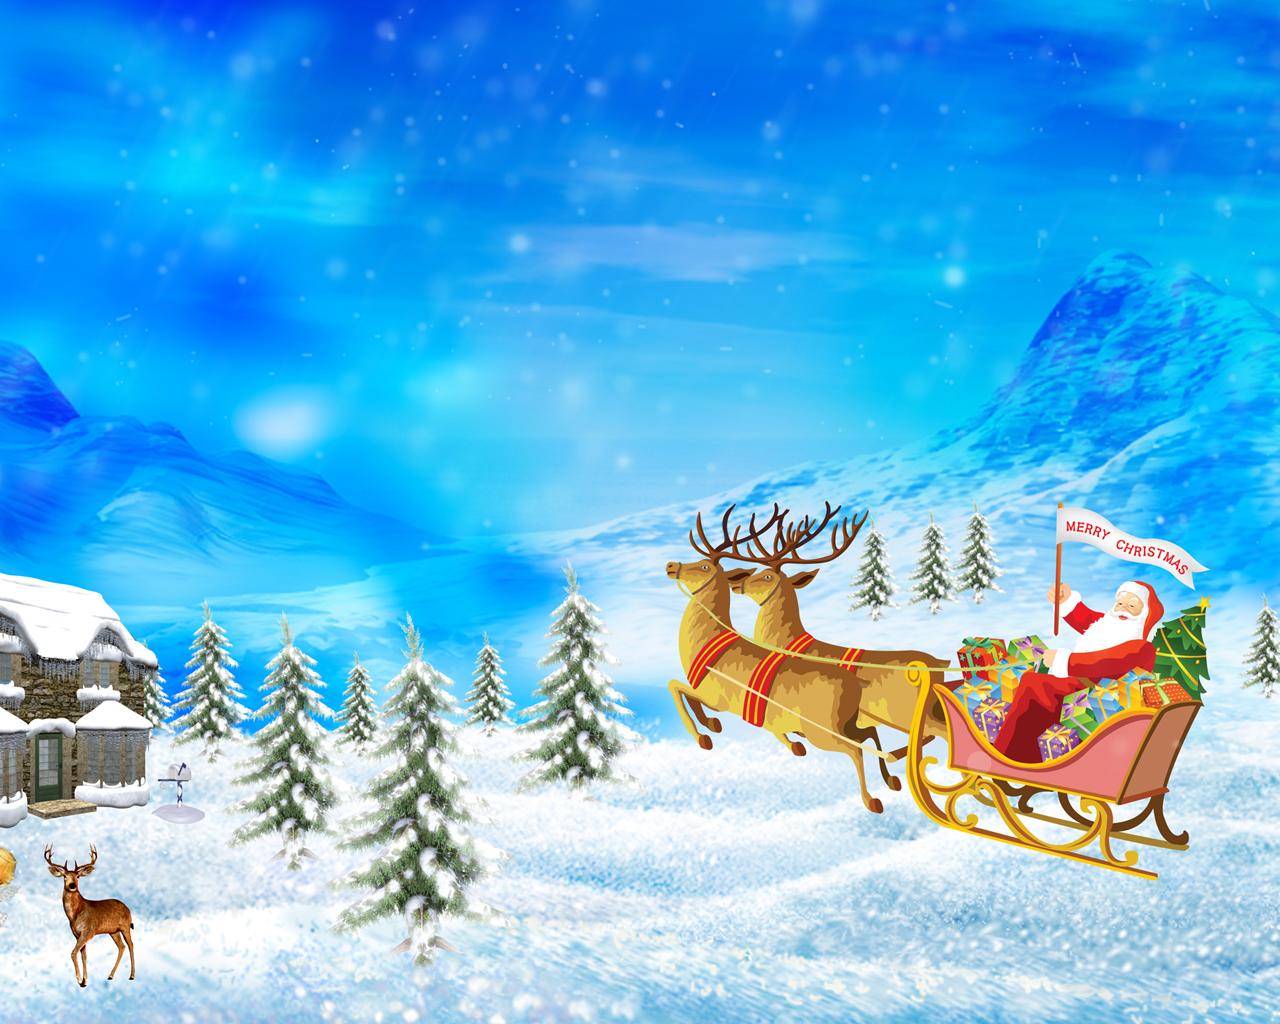 http://4.bp.blogspot.com/-PqUUk9YZW7o/UKob4YqAXxI/AAAAAAAACCs/9FOA6RSto7k/s1600/merry_christmas.jpg